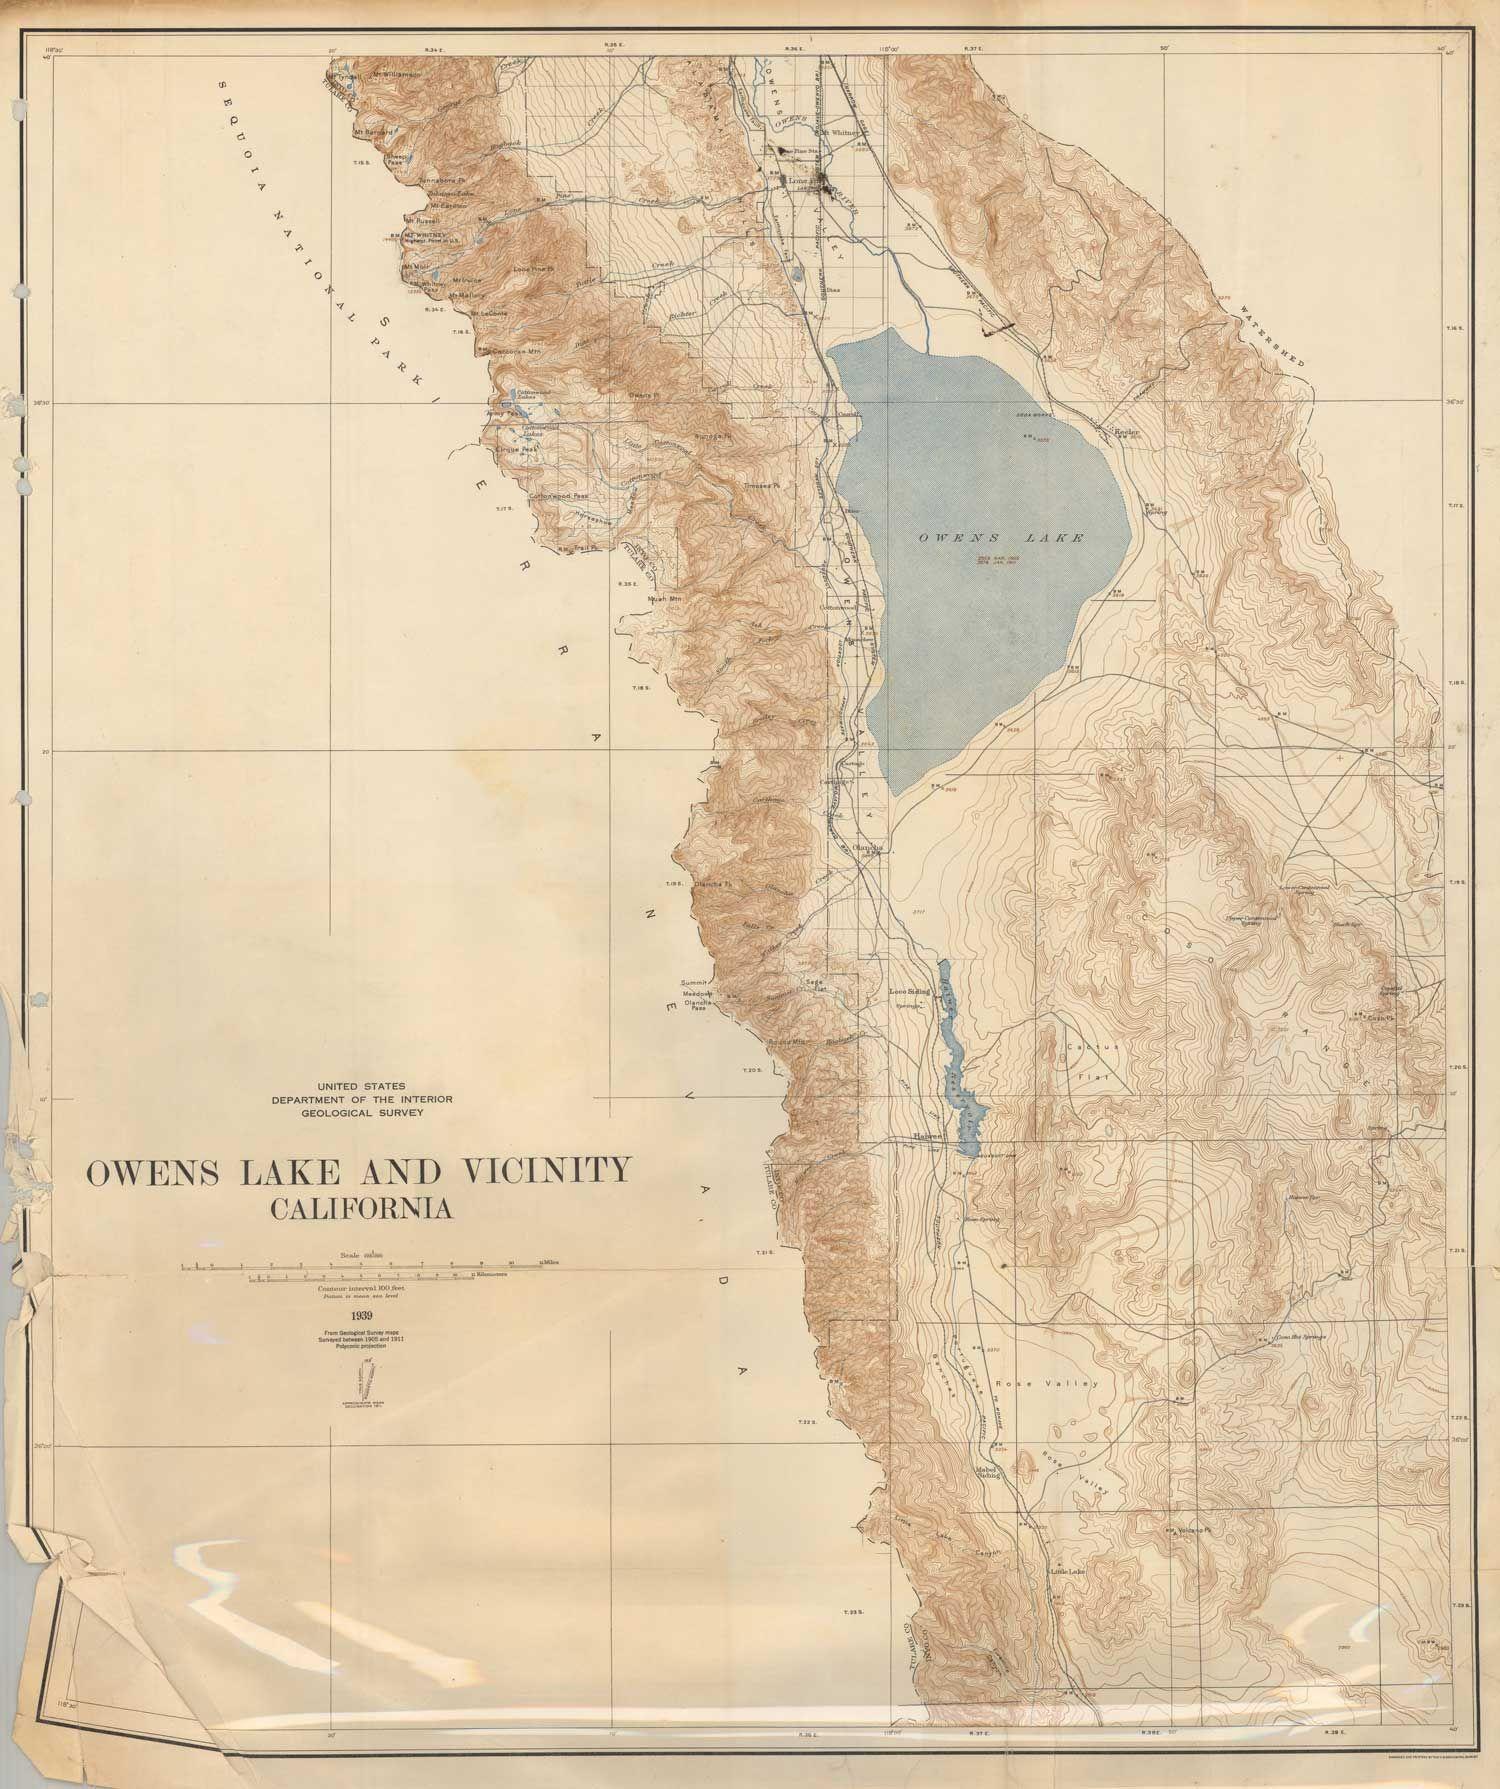 Los Angeles Maps California US Maps Of LA Los Angeles Los Angeles - Los angeles california map united states